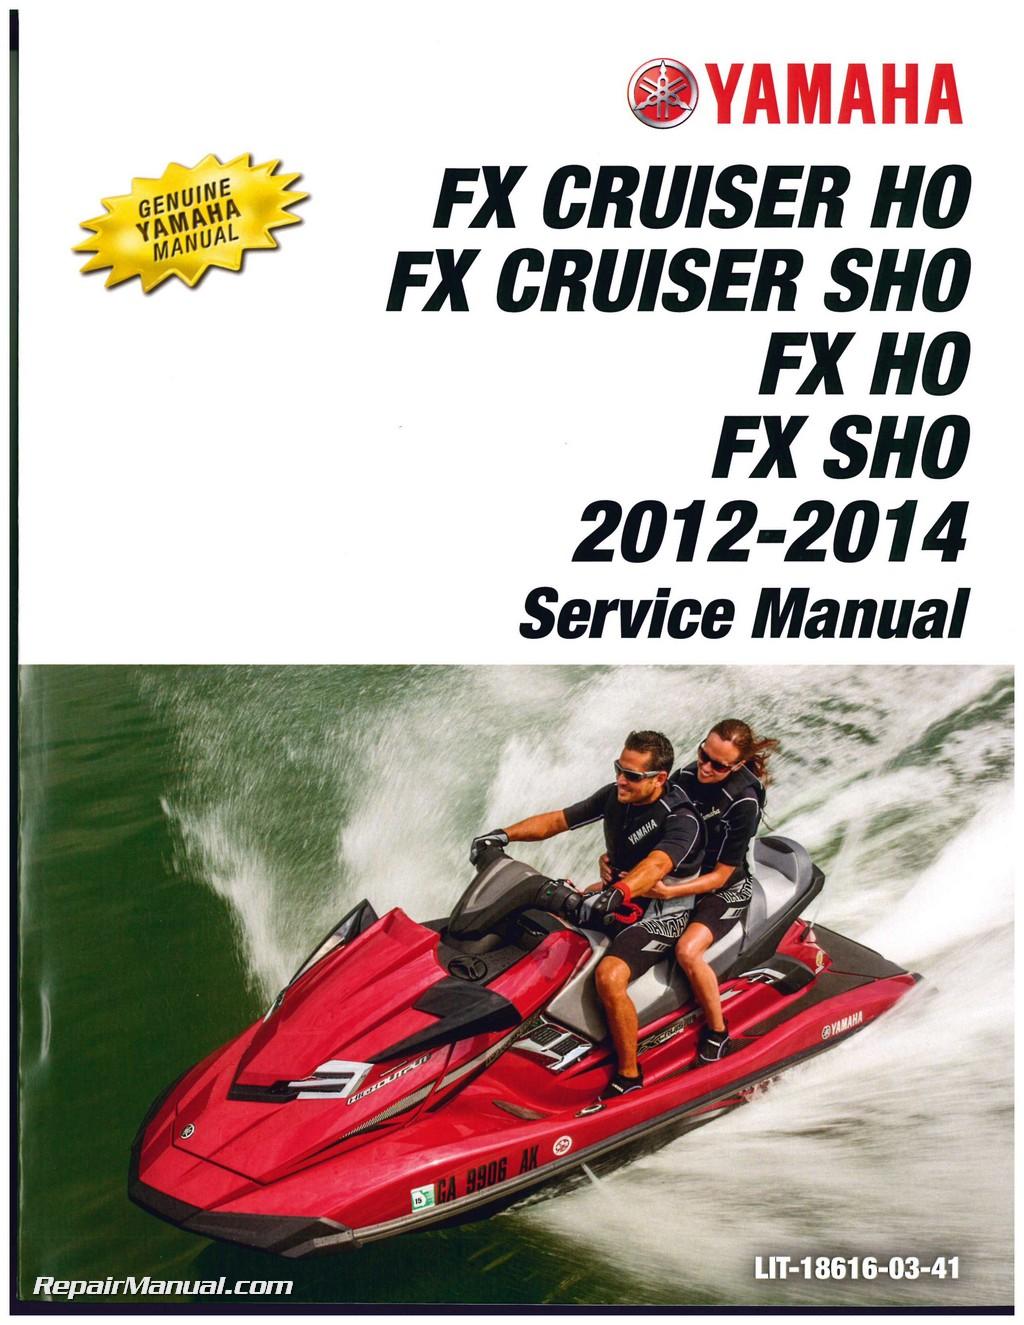 Honda Jet Ski >> 2012-2014 Yamaha FX Cruiser HO/SHO FX HO/SHO Personal Watercraft Service Manual